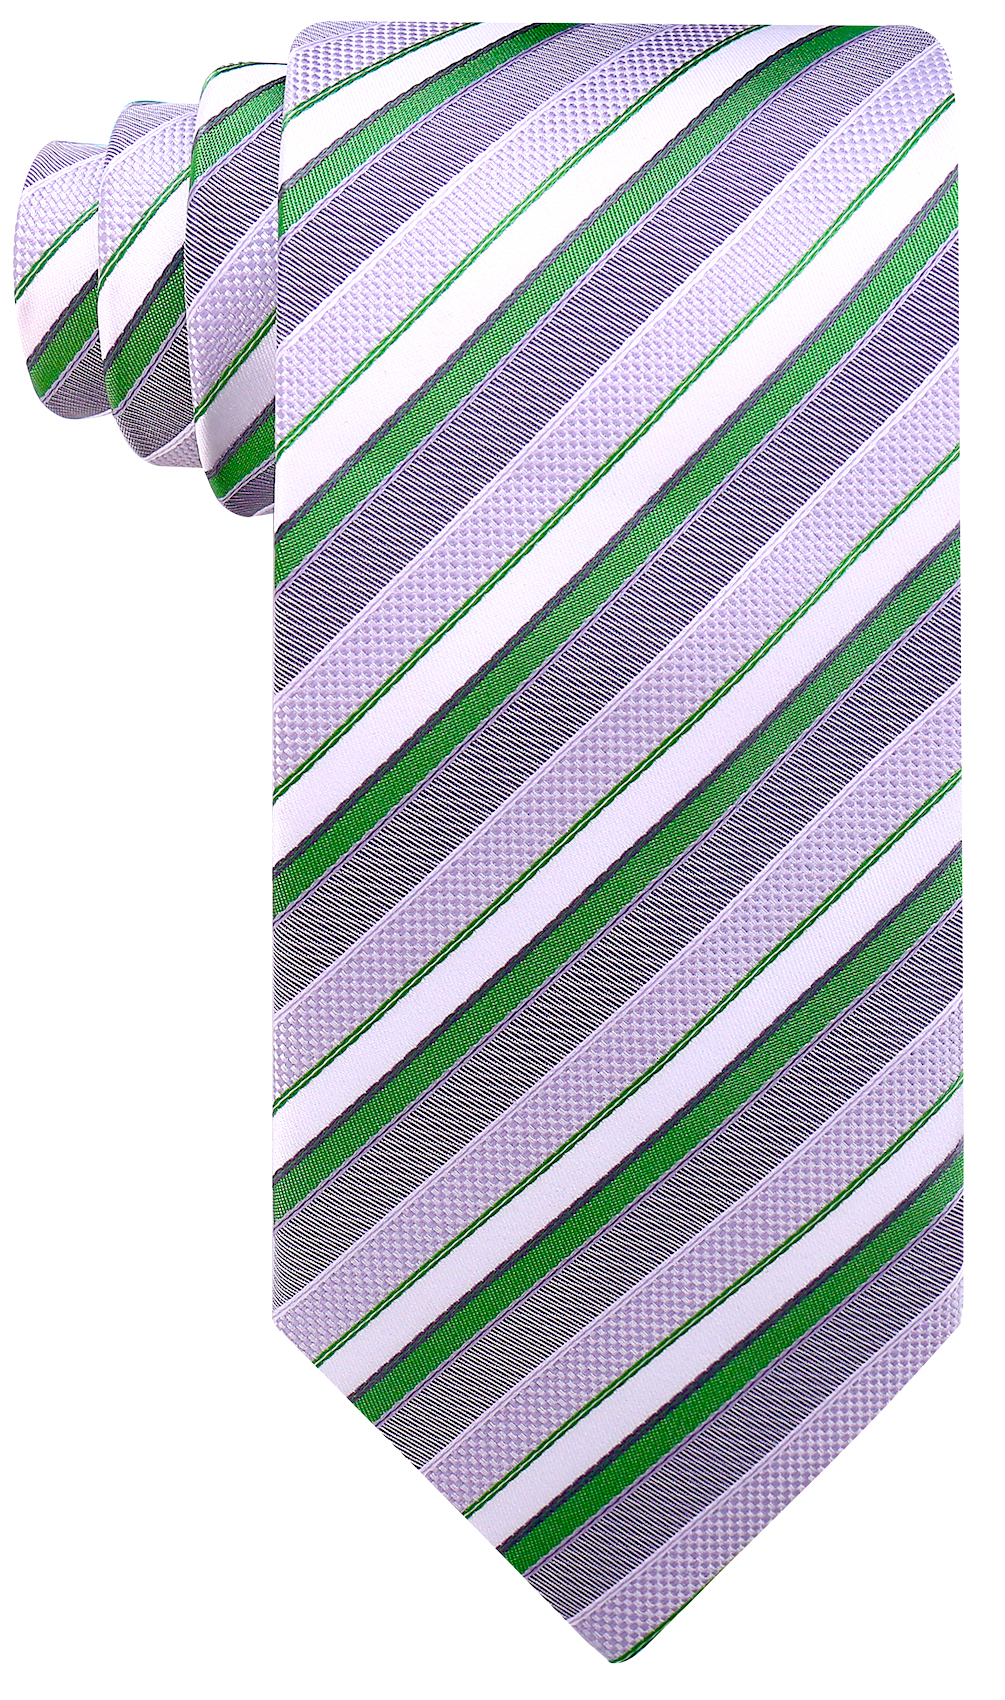 Scott-Allan-Striped-Necktie-Mens-Ties-in-Various-Colors thumbnail 13